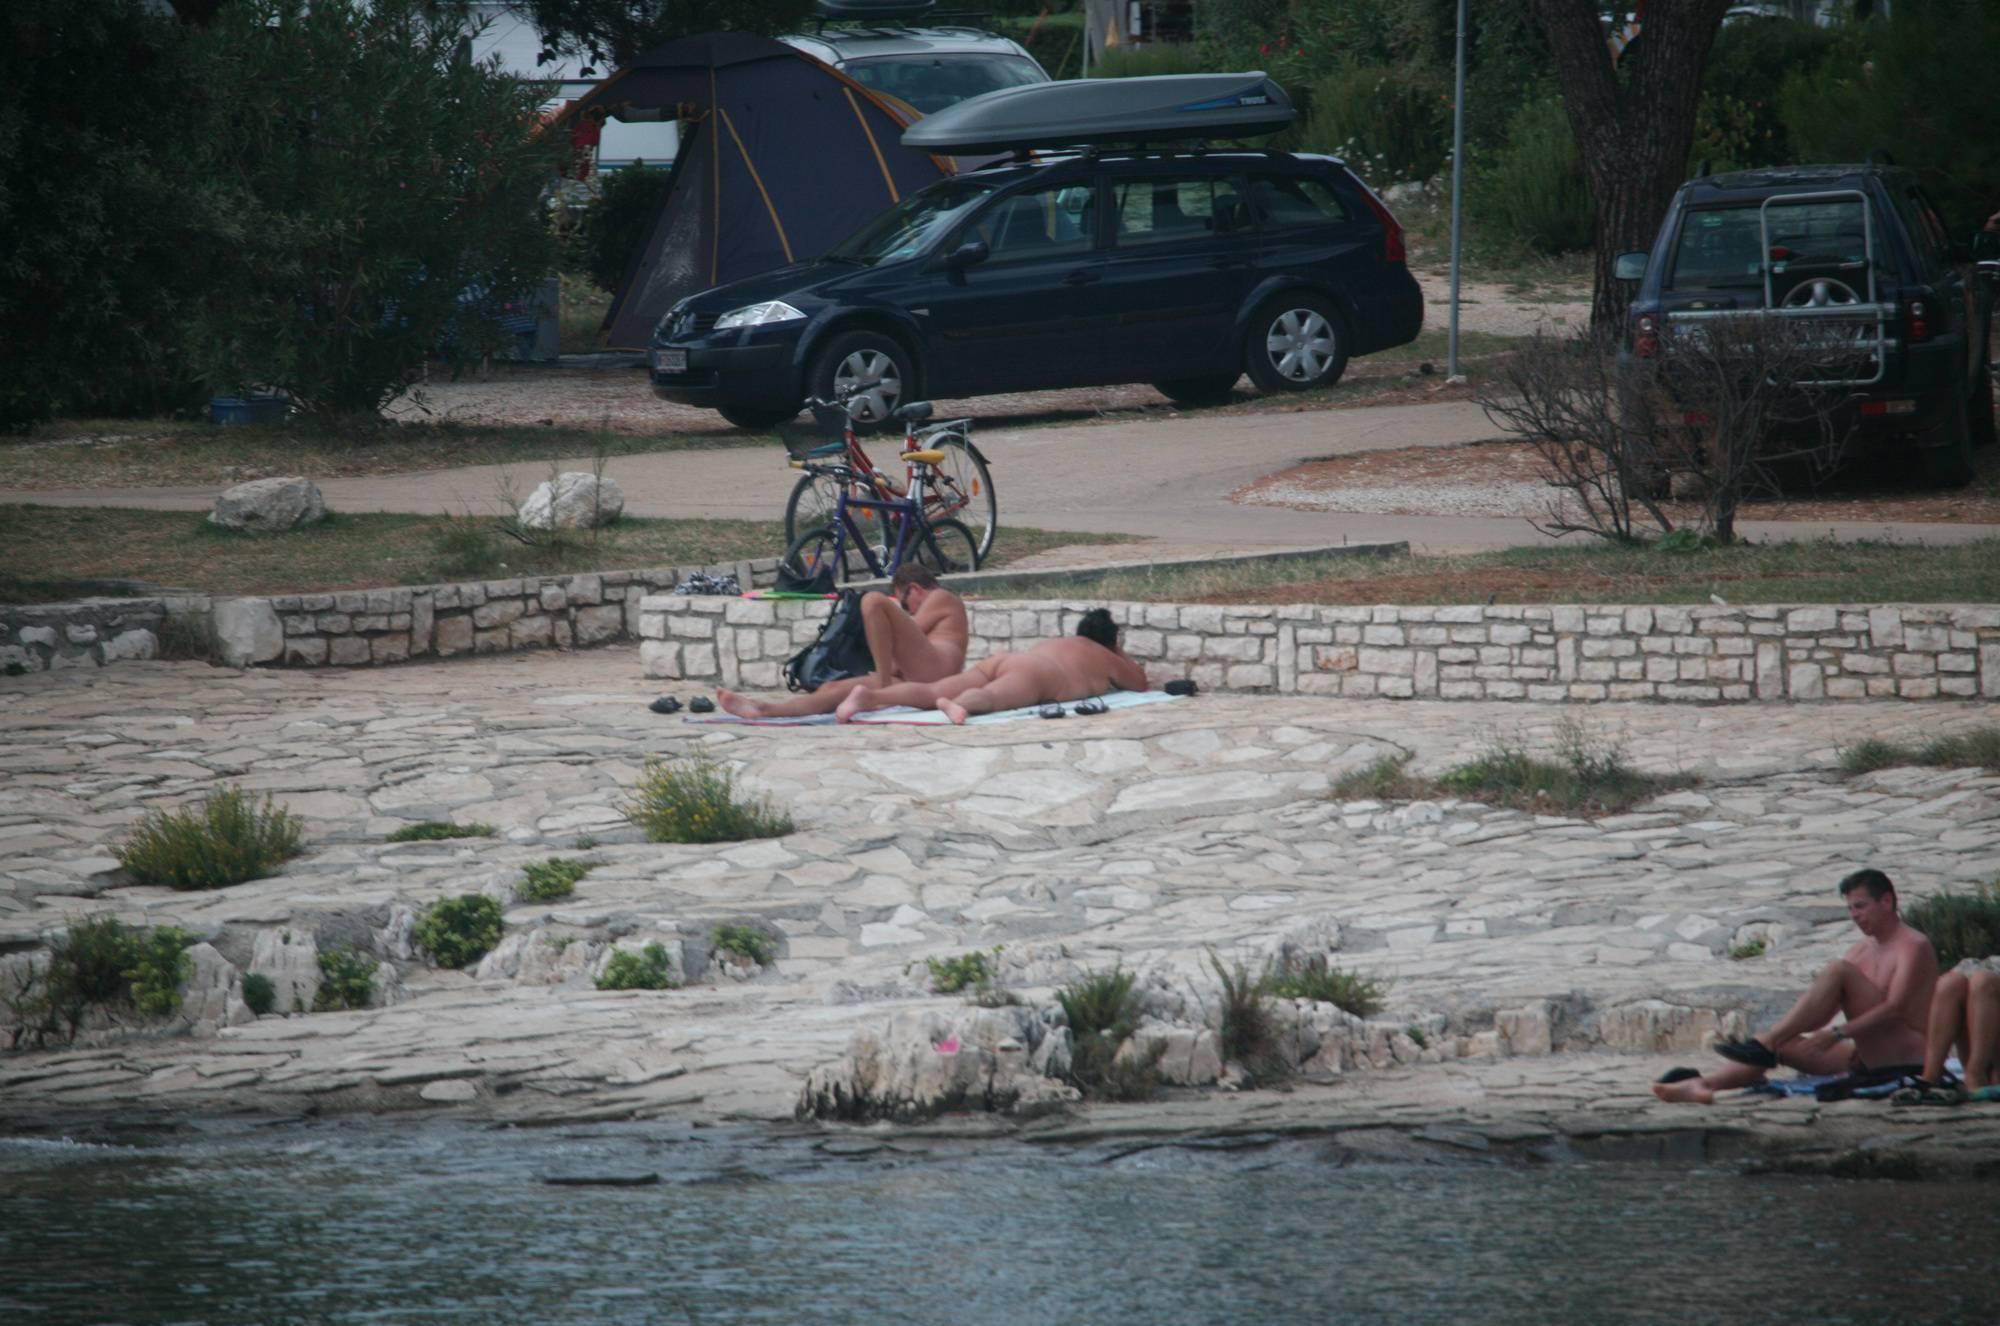 Nudist Photos Nude Beach Bridge Cross - 1